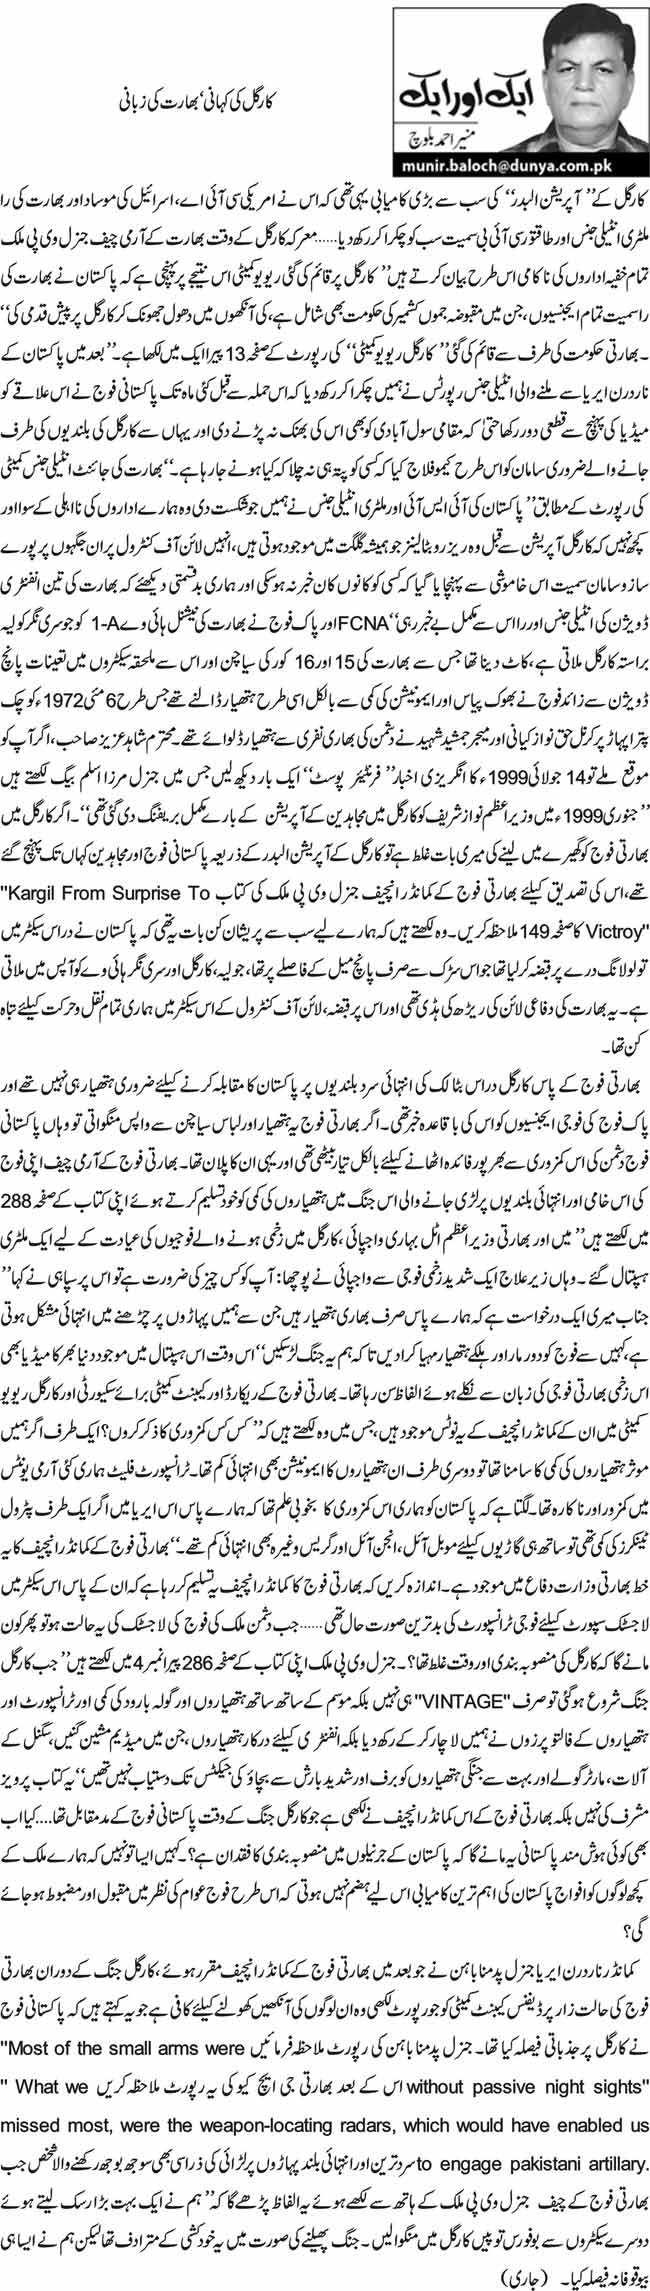 Story of Kargil 14 5 14